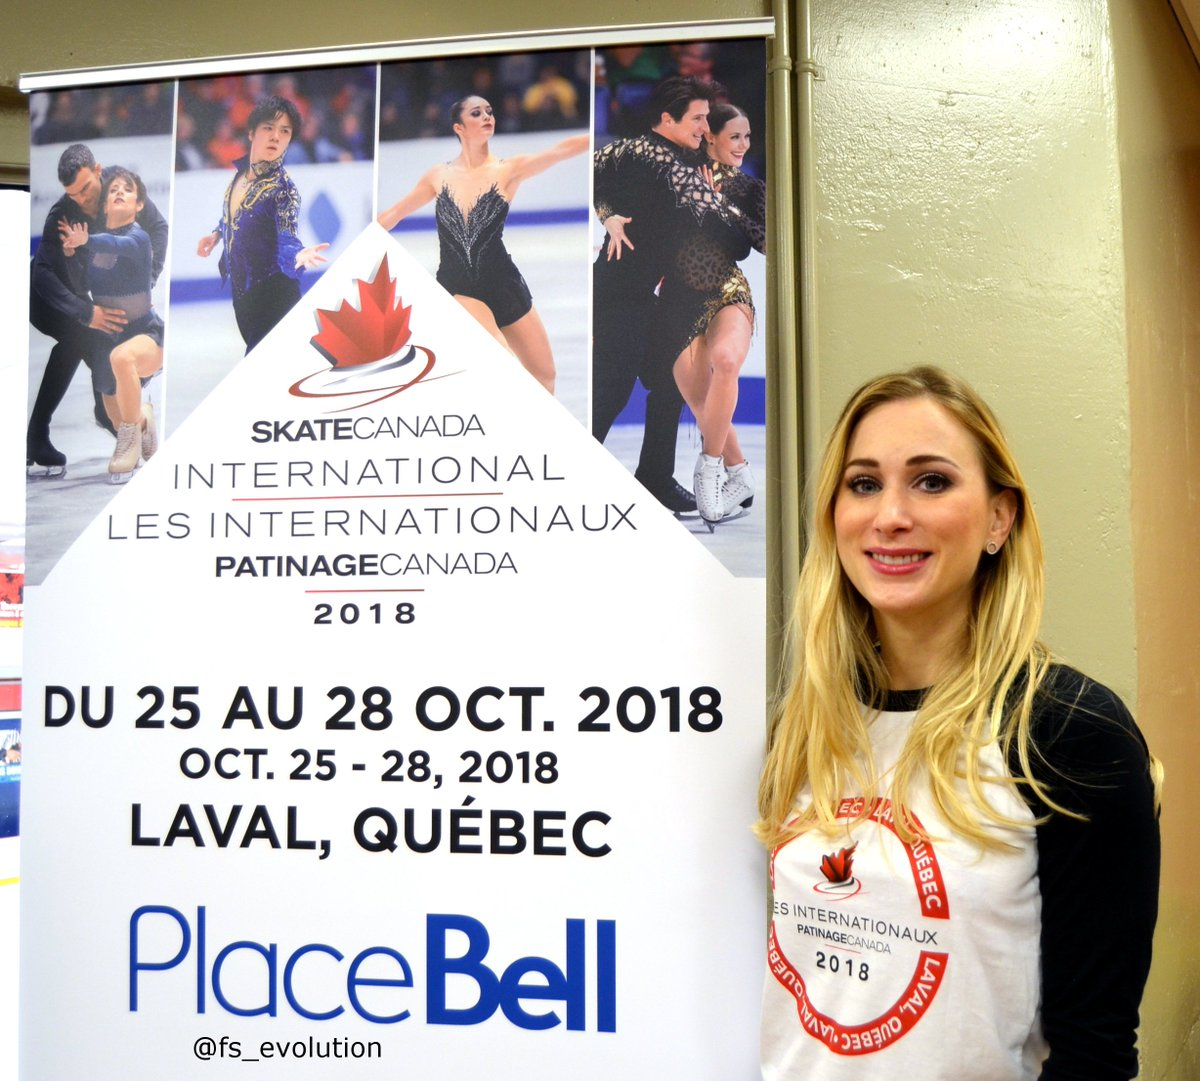 GP - 2 этап. Oct 26 - Oct 28 2018, Skate Canada, Laval, QC /CAN DpJ_jFAXUAIeKUD